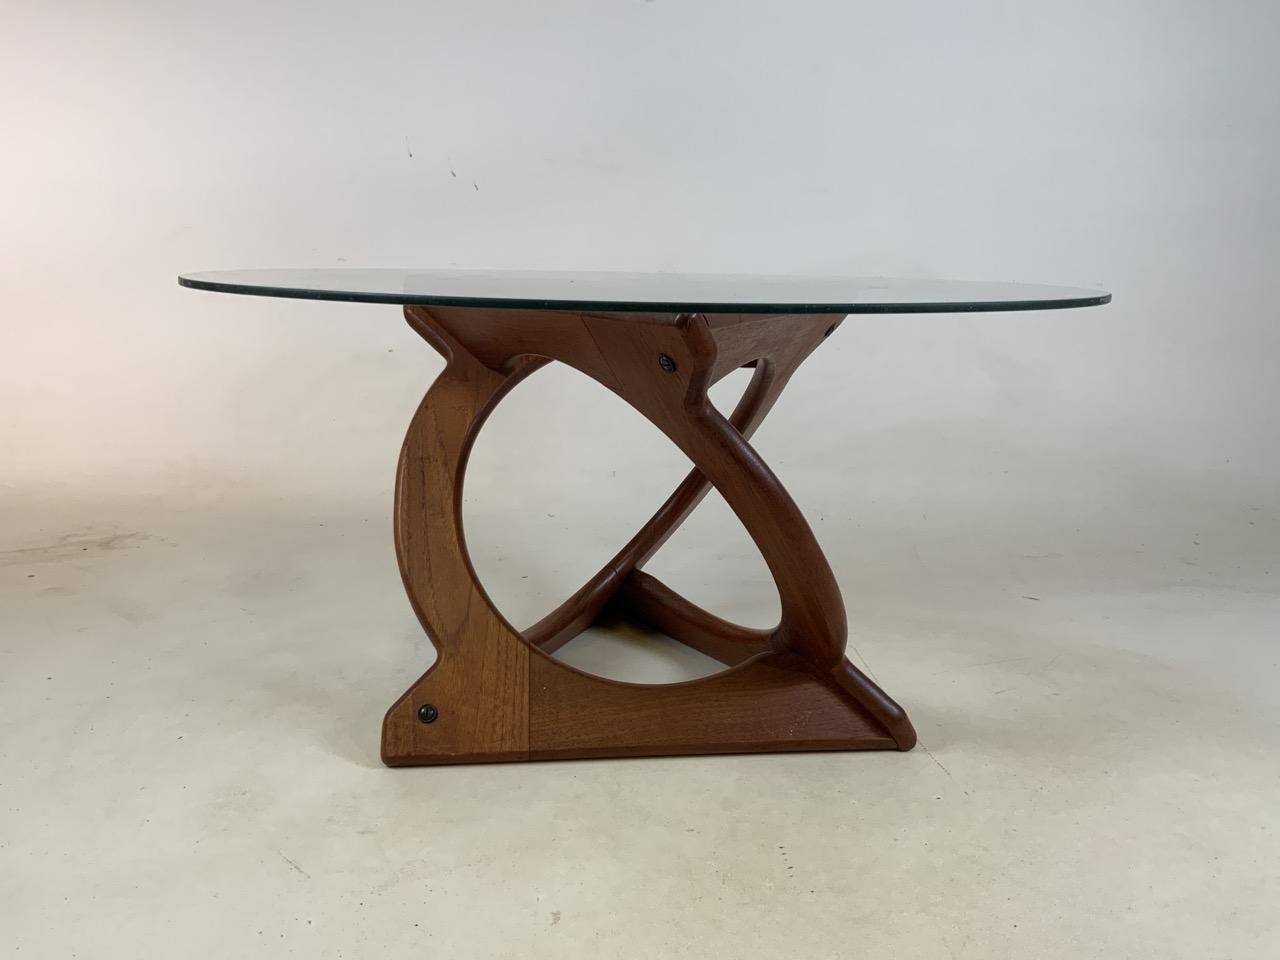 A Danish Glass top coffee table by Georg Jenson for Kubus. Diameter 75cm, Heoght 39cm